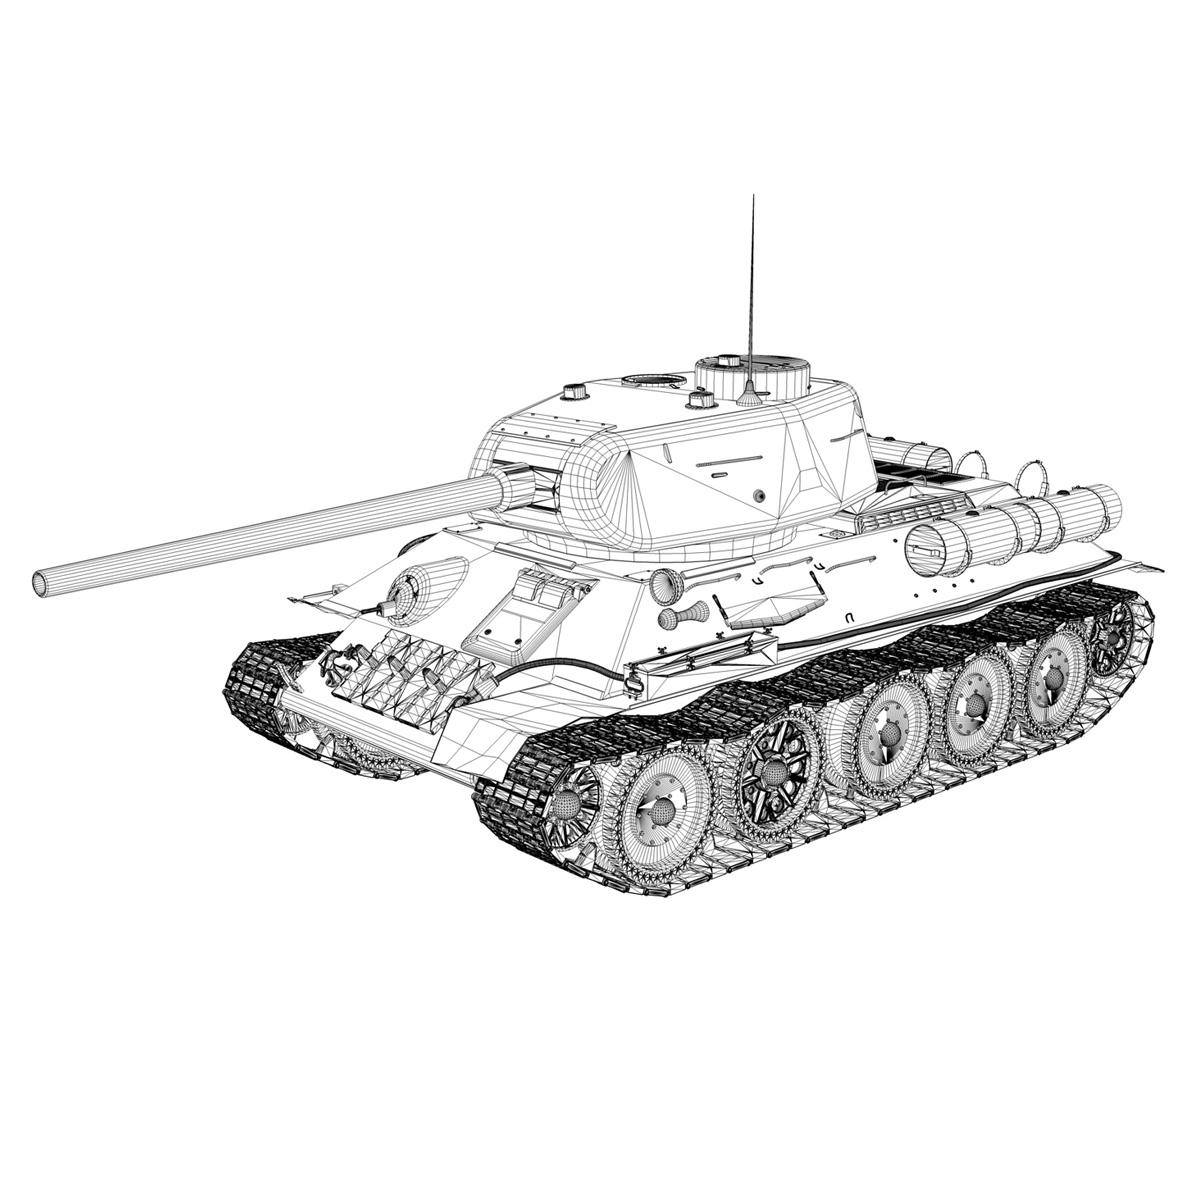 t-34 85 – soviet medium tank – 120 3d model 3ds fbx lwo lw lws obj c4d 265378